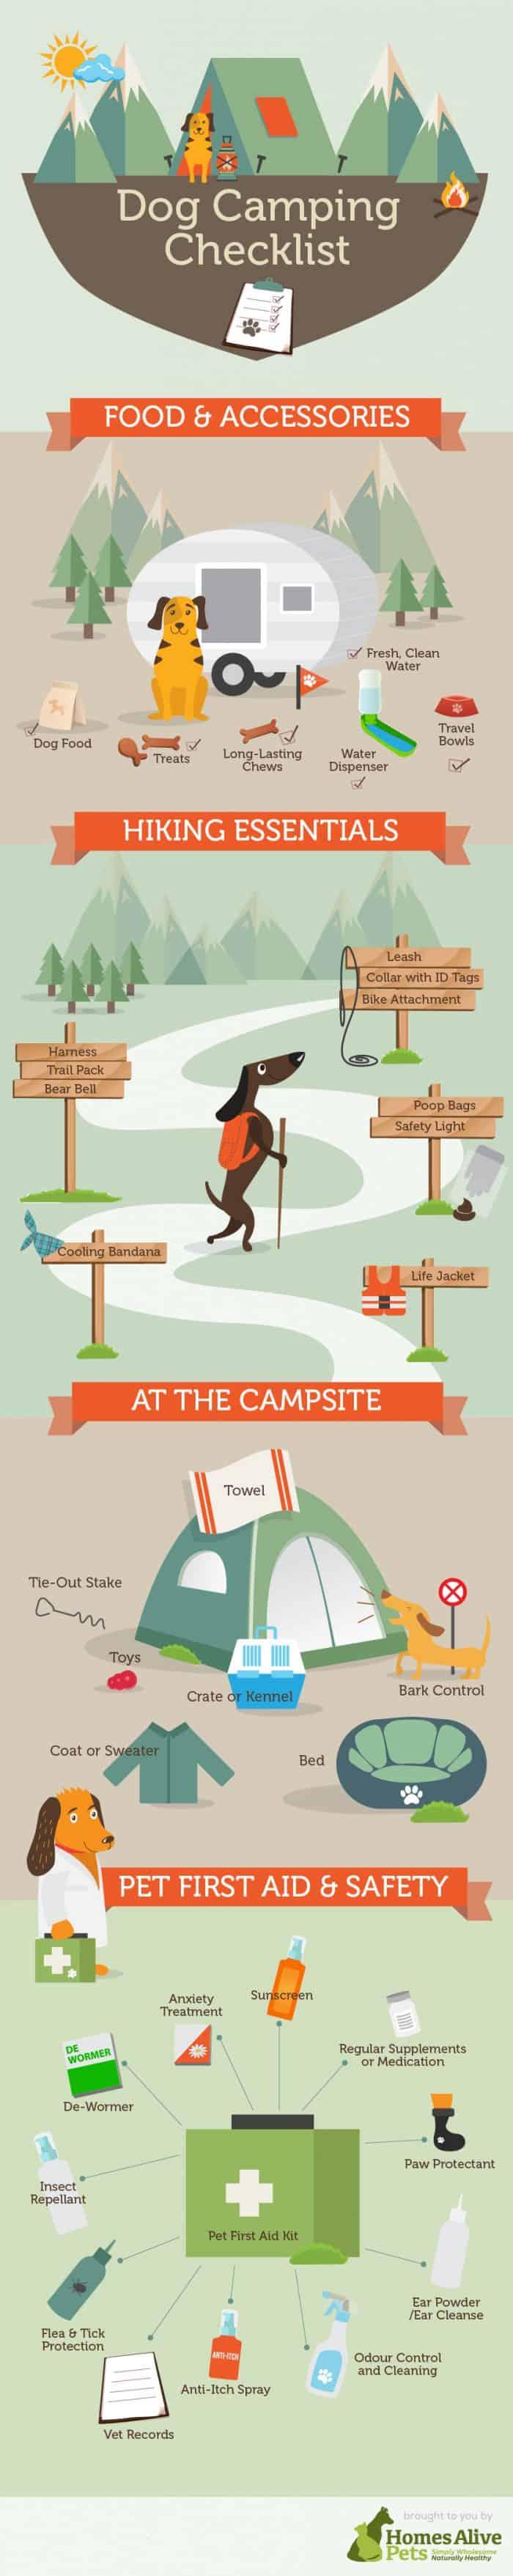 dog camping checklist